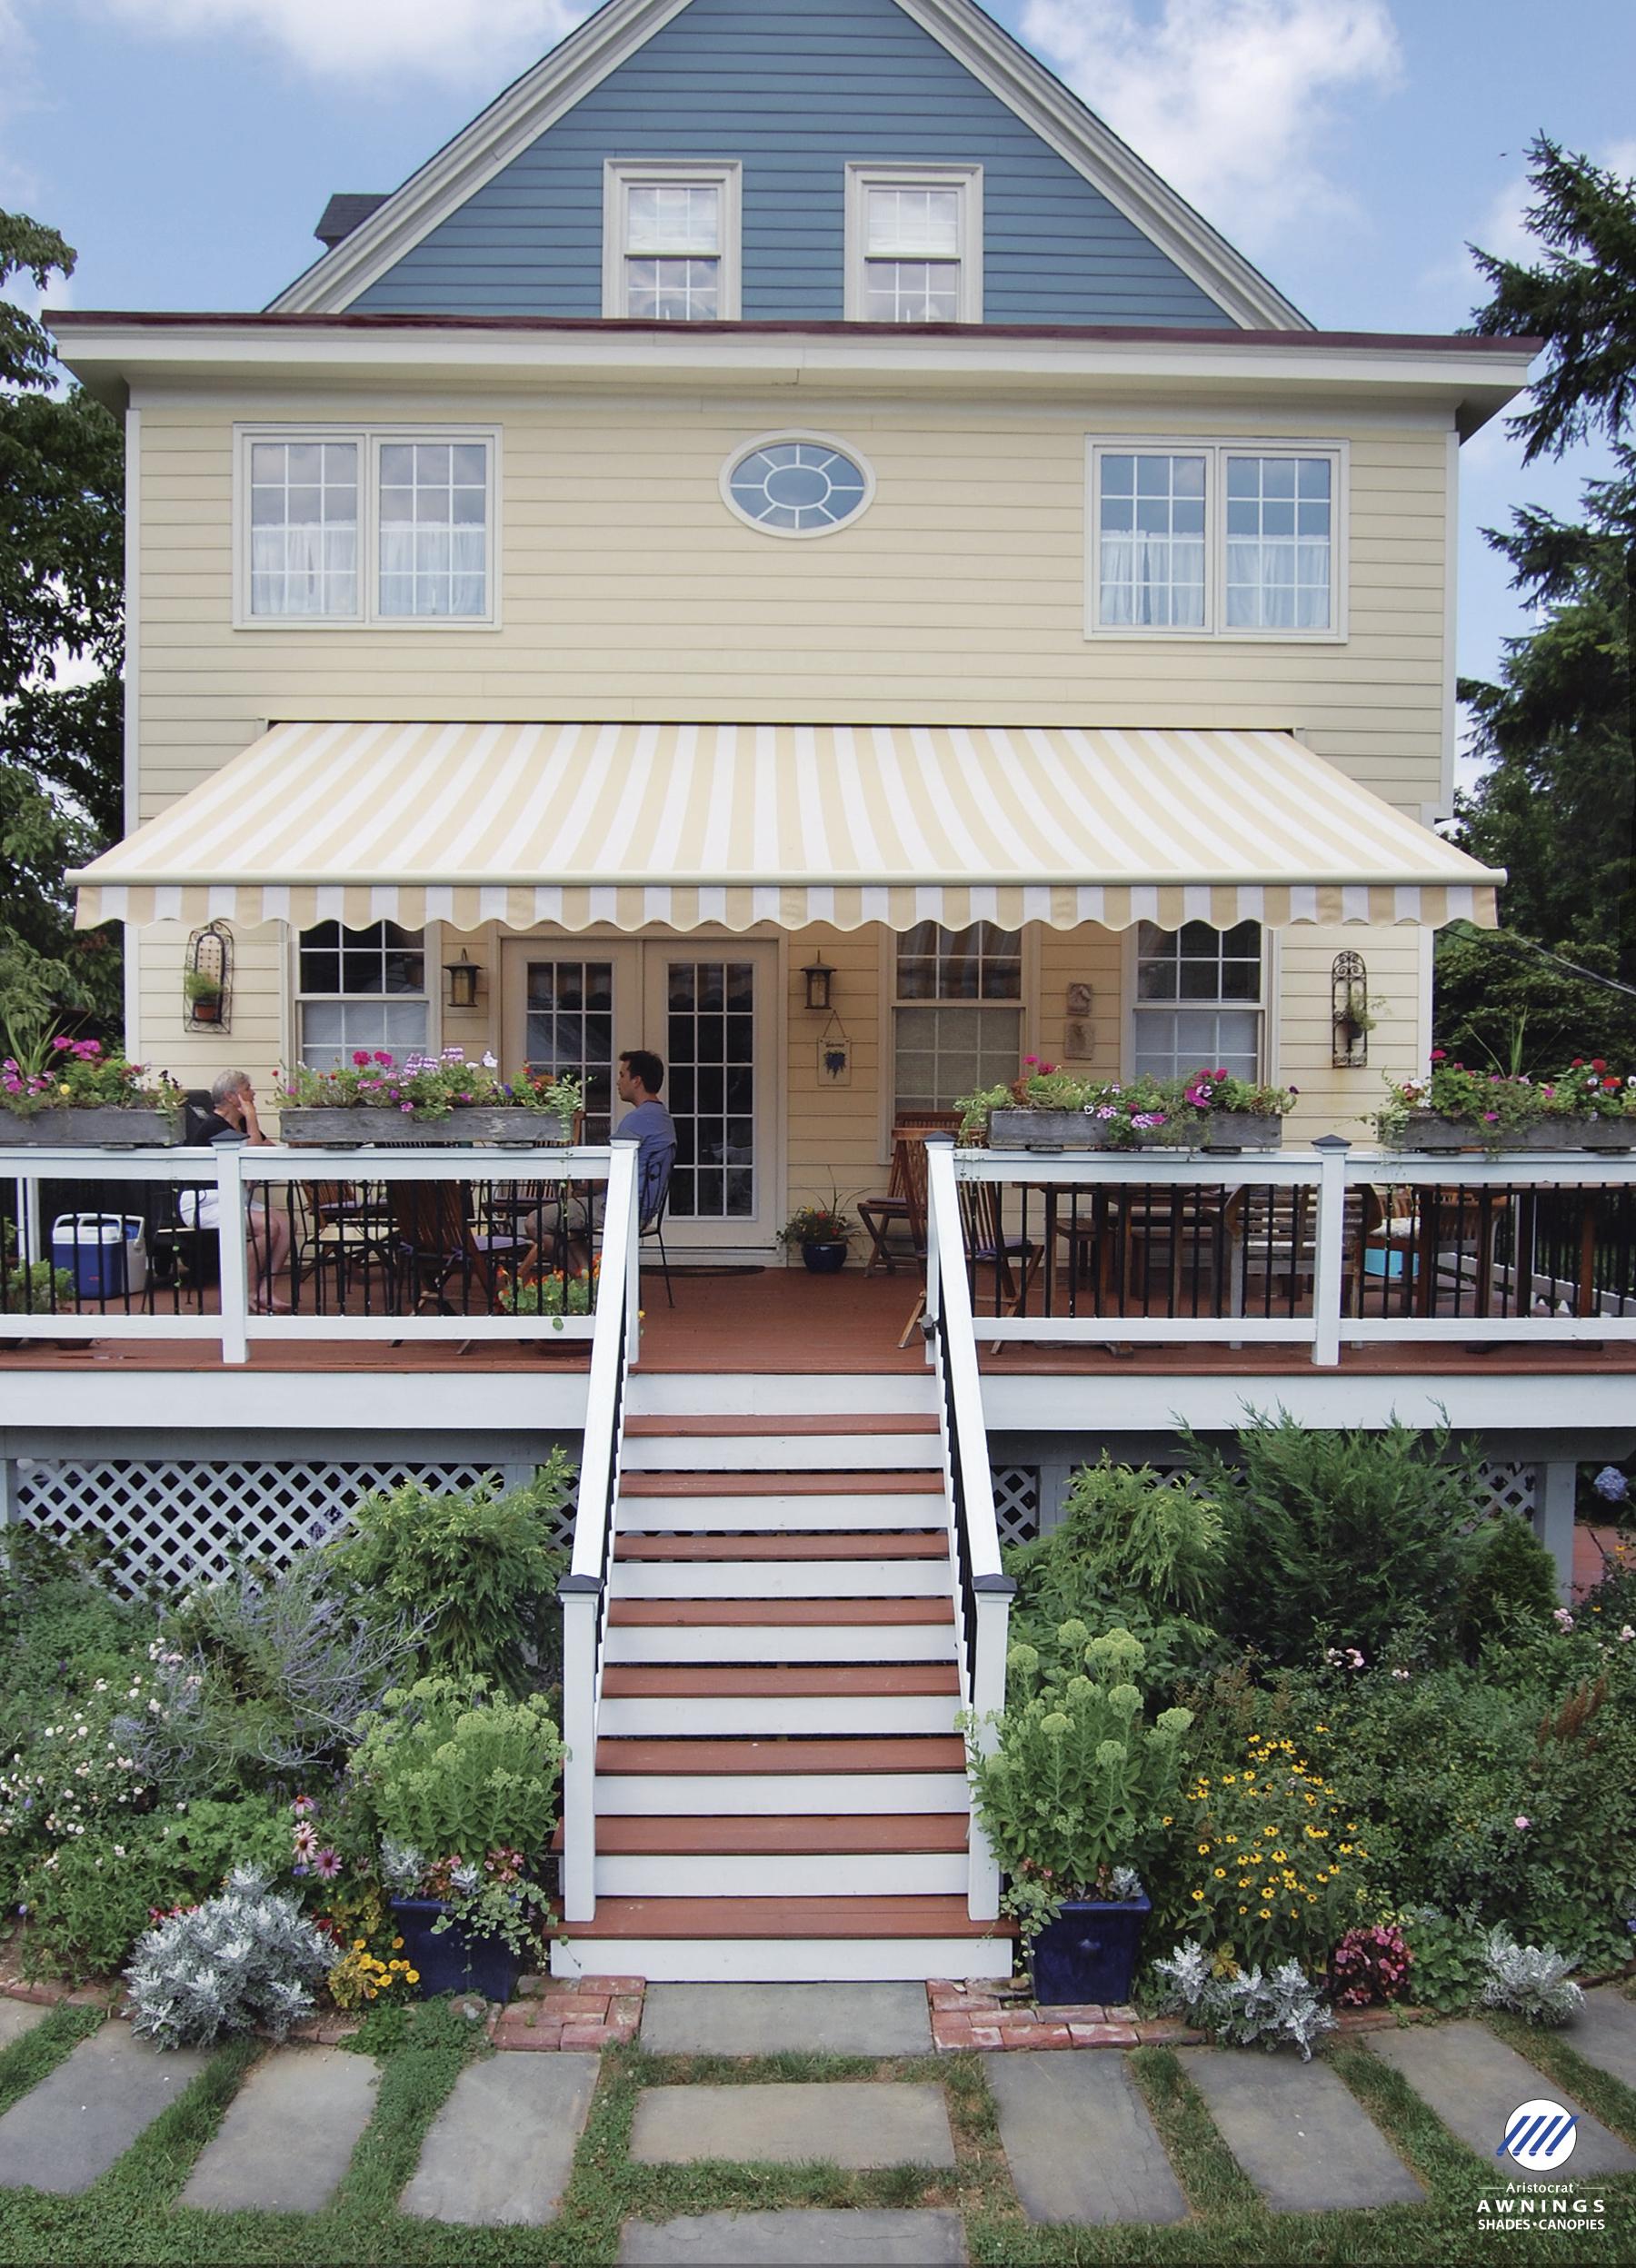 Estate Awning 1 Bra Heartland Home Improvements Llc